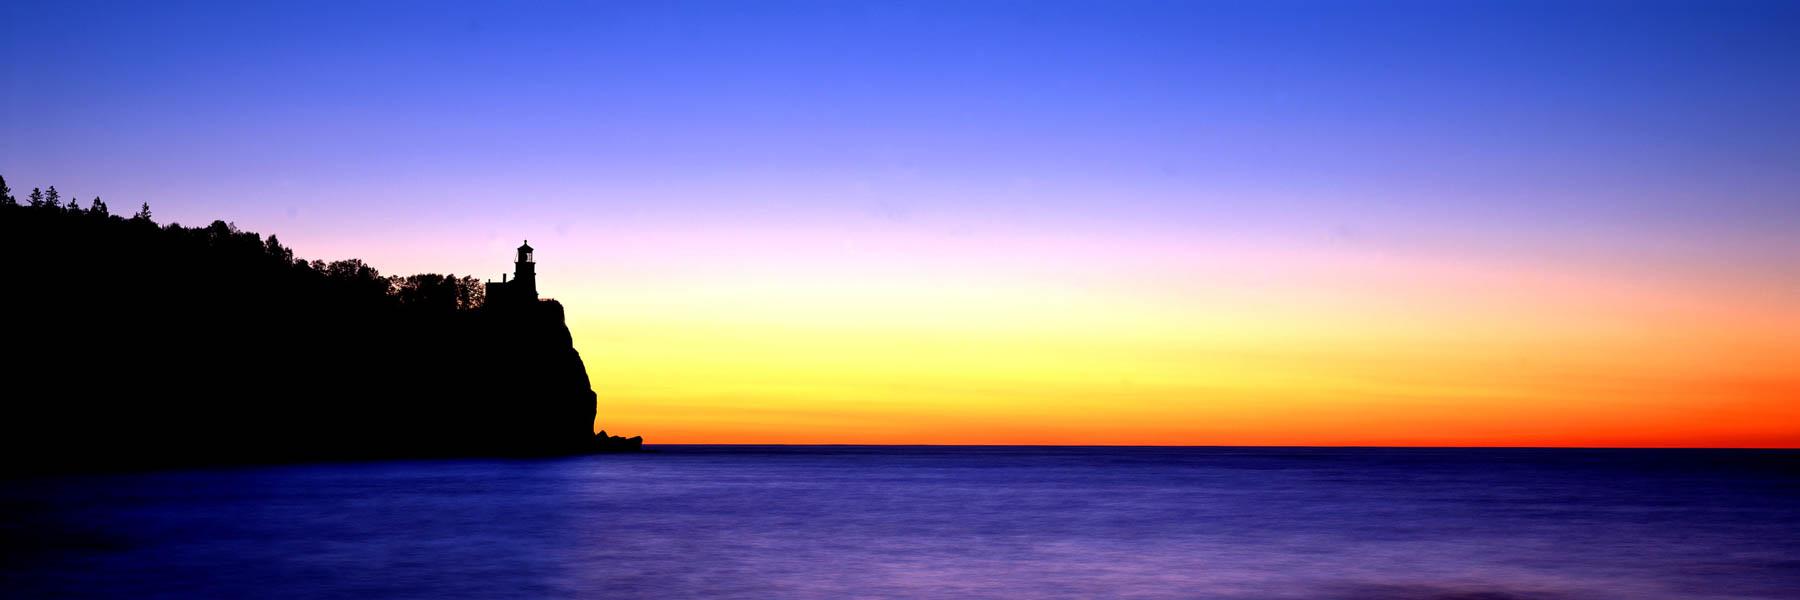 Splitrock Lighthouse, Maine, USA.